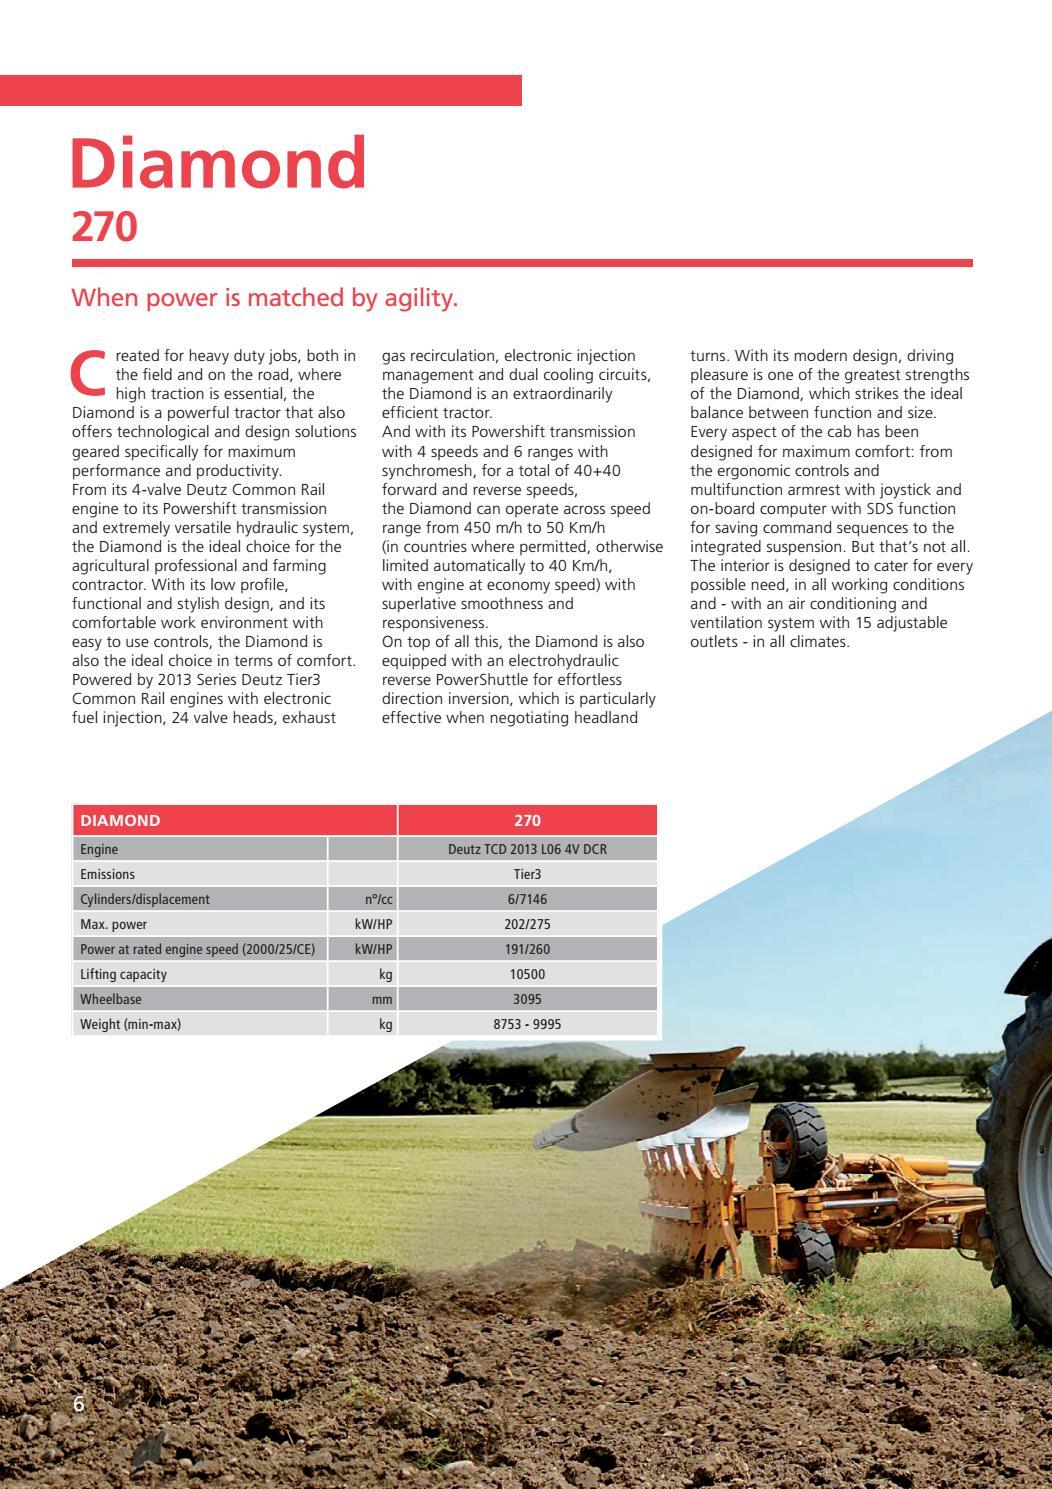 SAME Diamond_Leaflet_English by SAME - Tractors - issuu